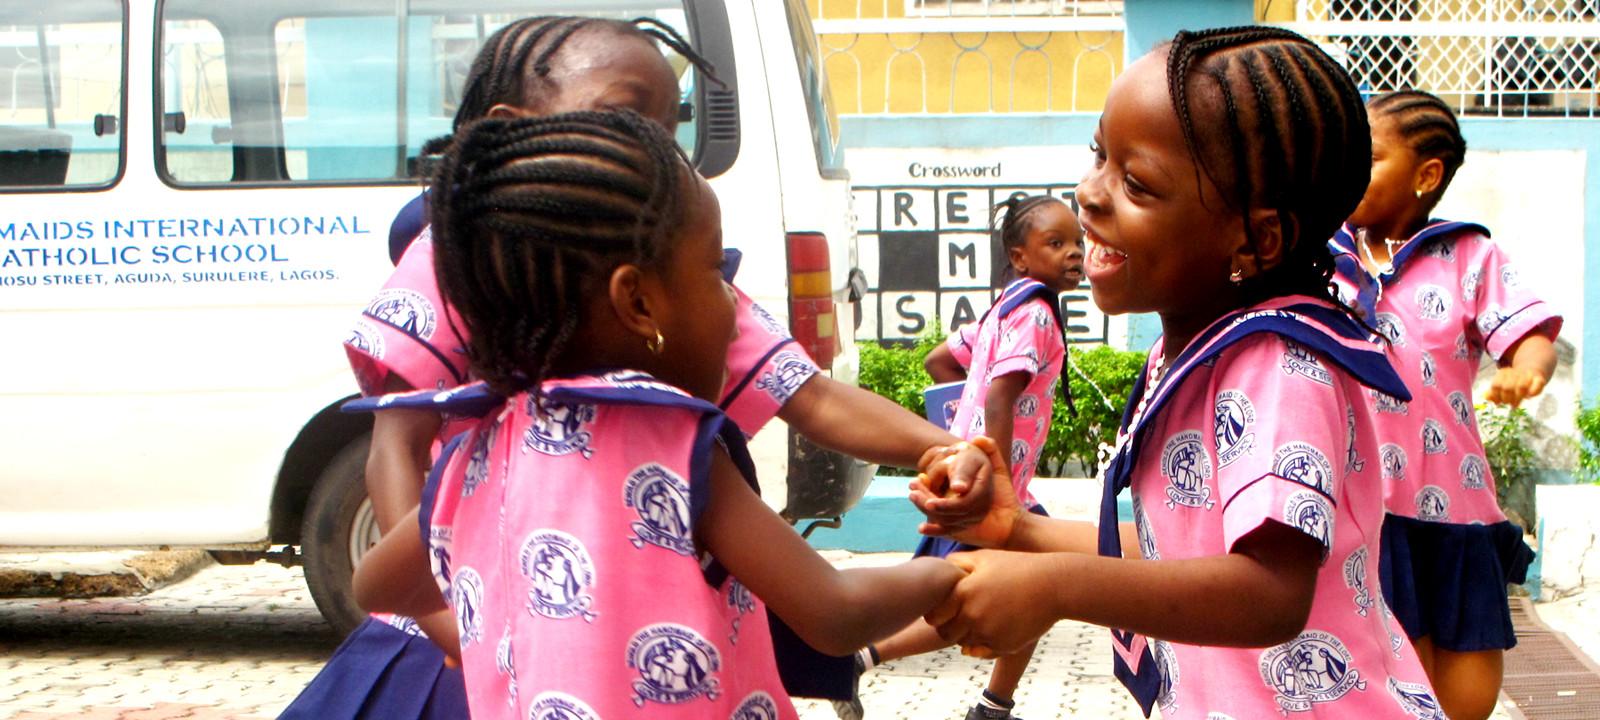 Handmaids International Catholic School Aguda